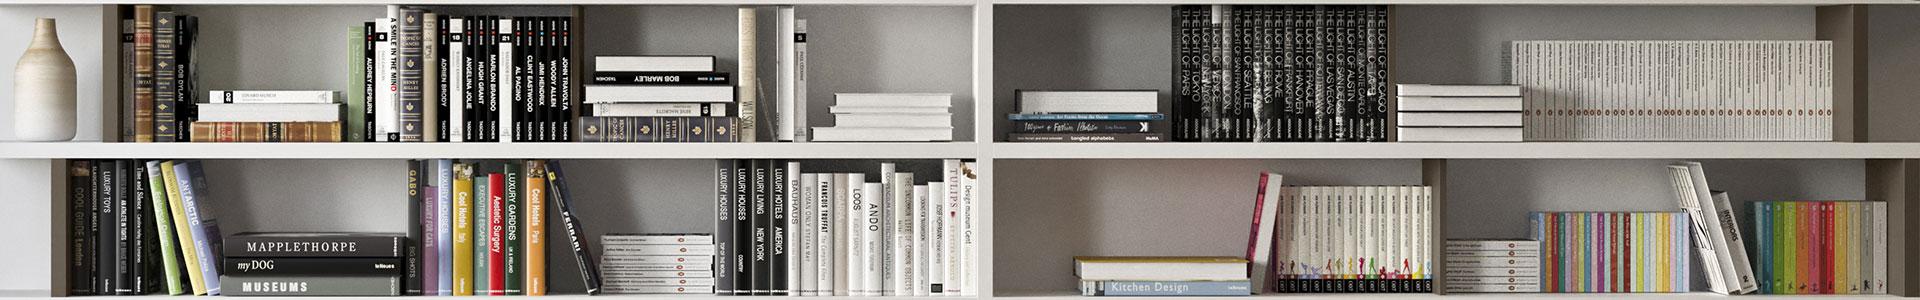 librerie moderne catalogo online completo e prezzi in